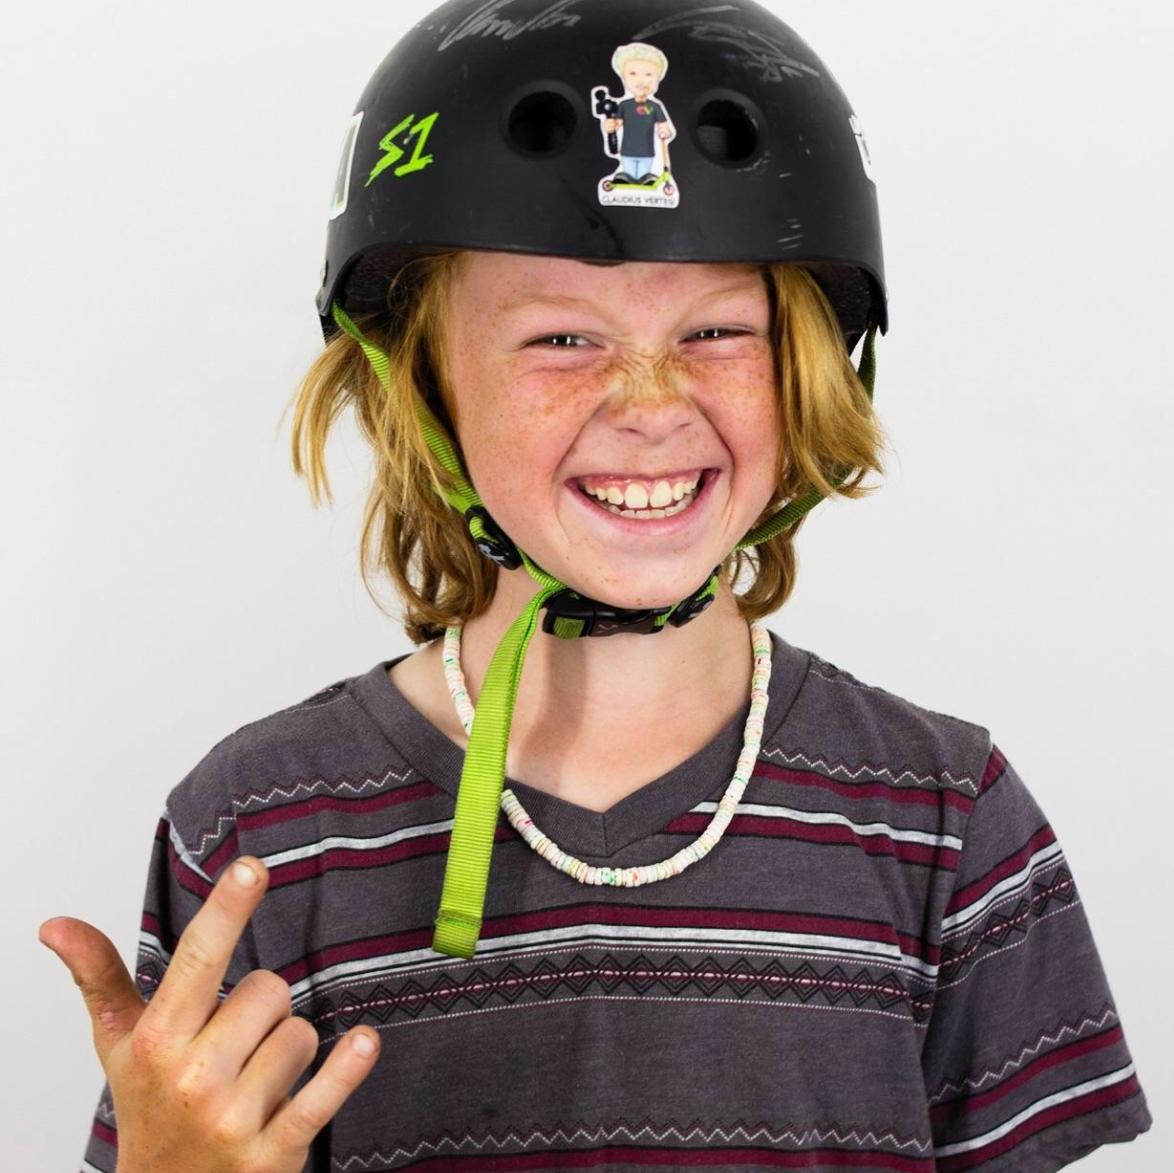 ADVANCED Rider: Jack Walsh  Ronka Pro Scooters  @jackwalsh702